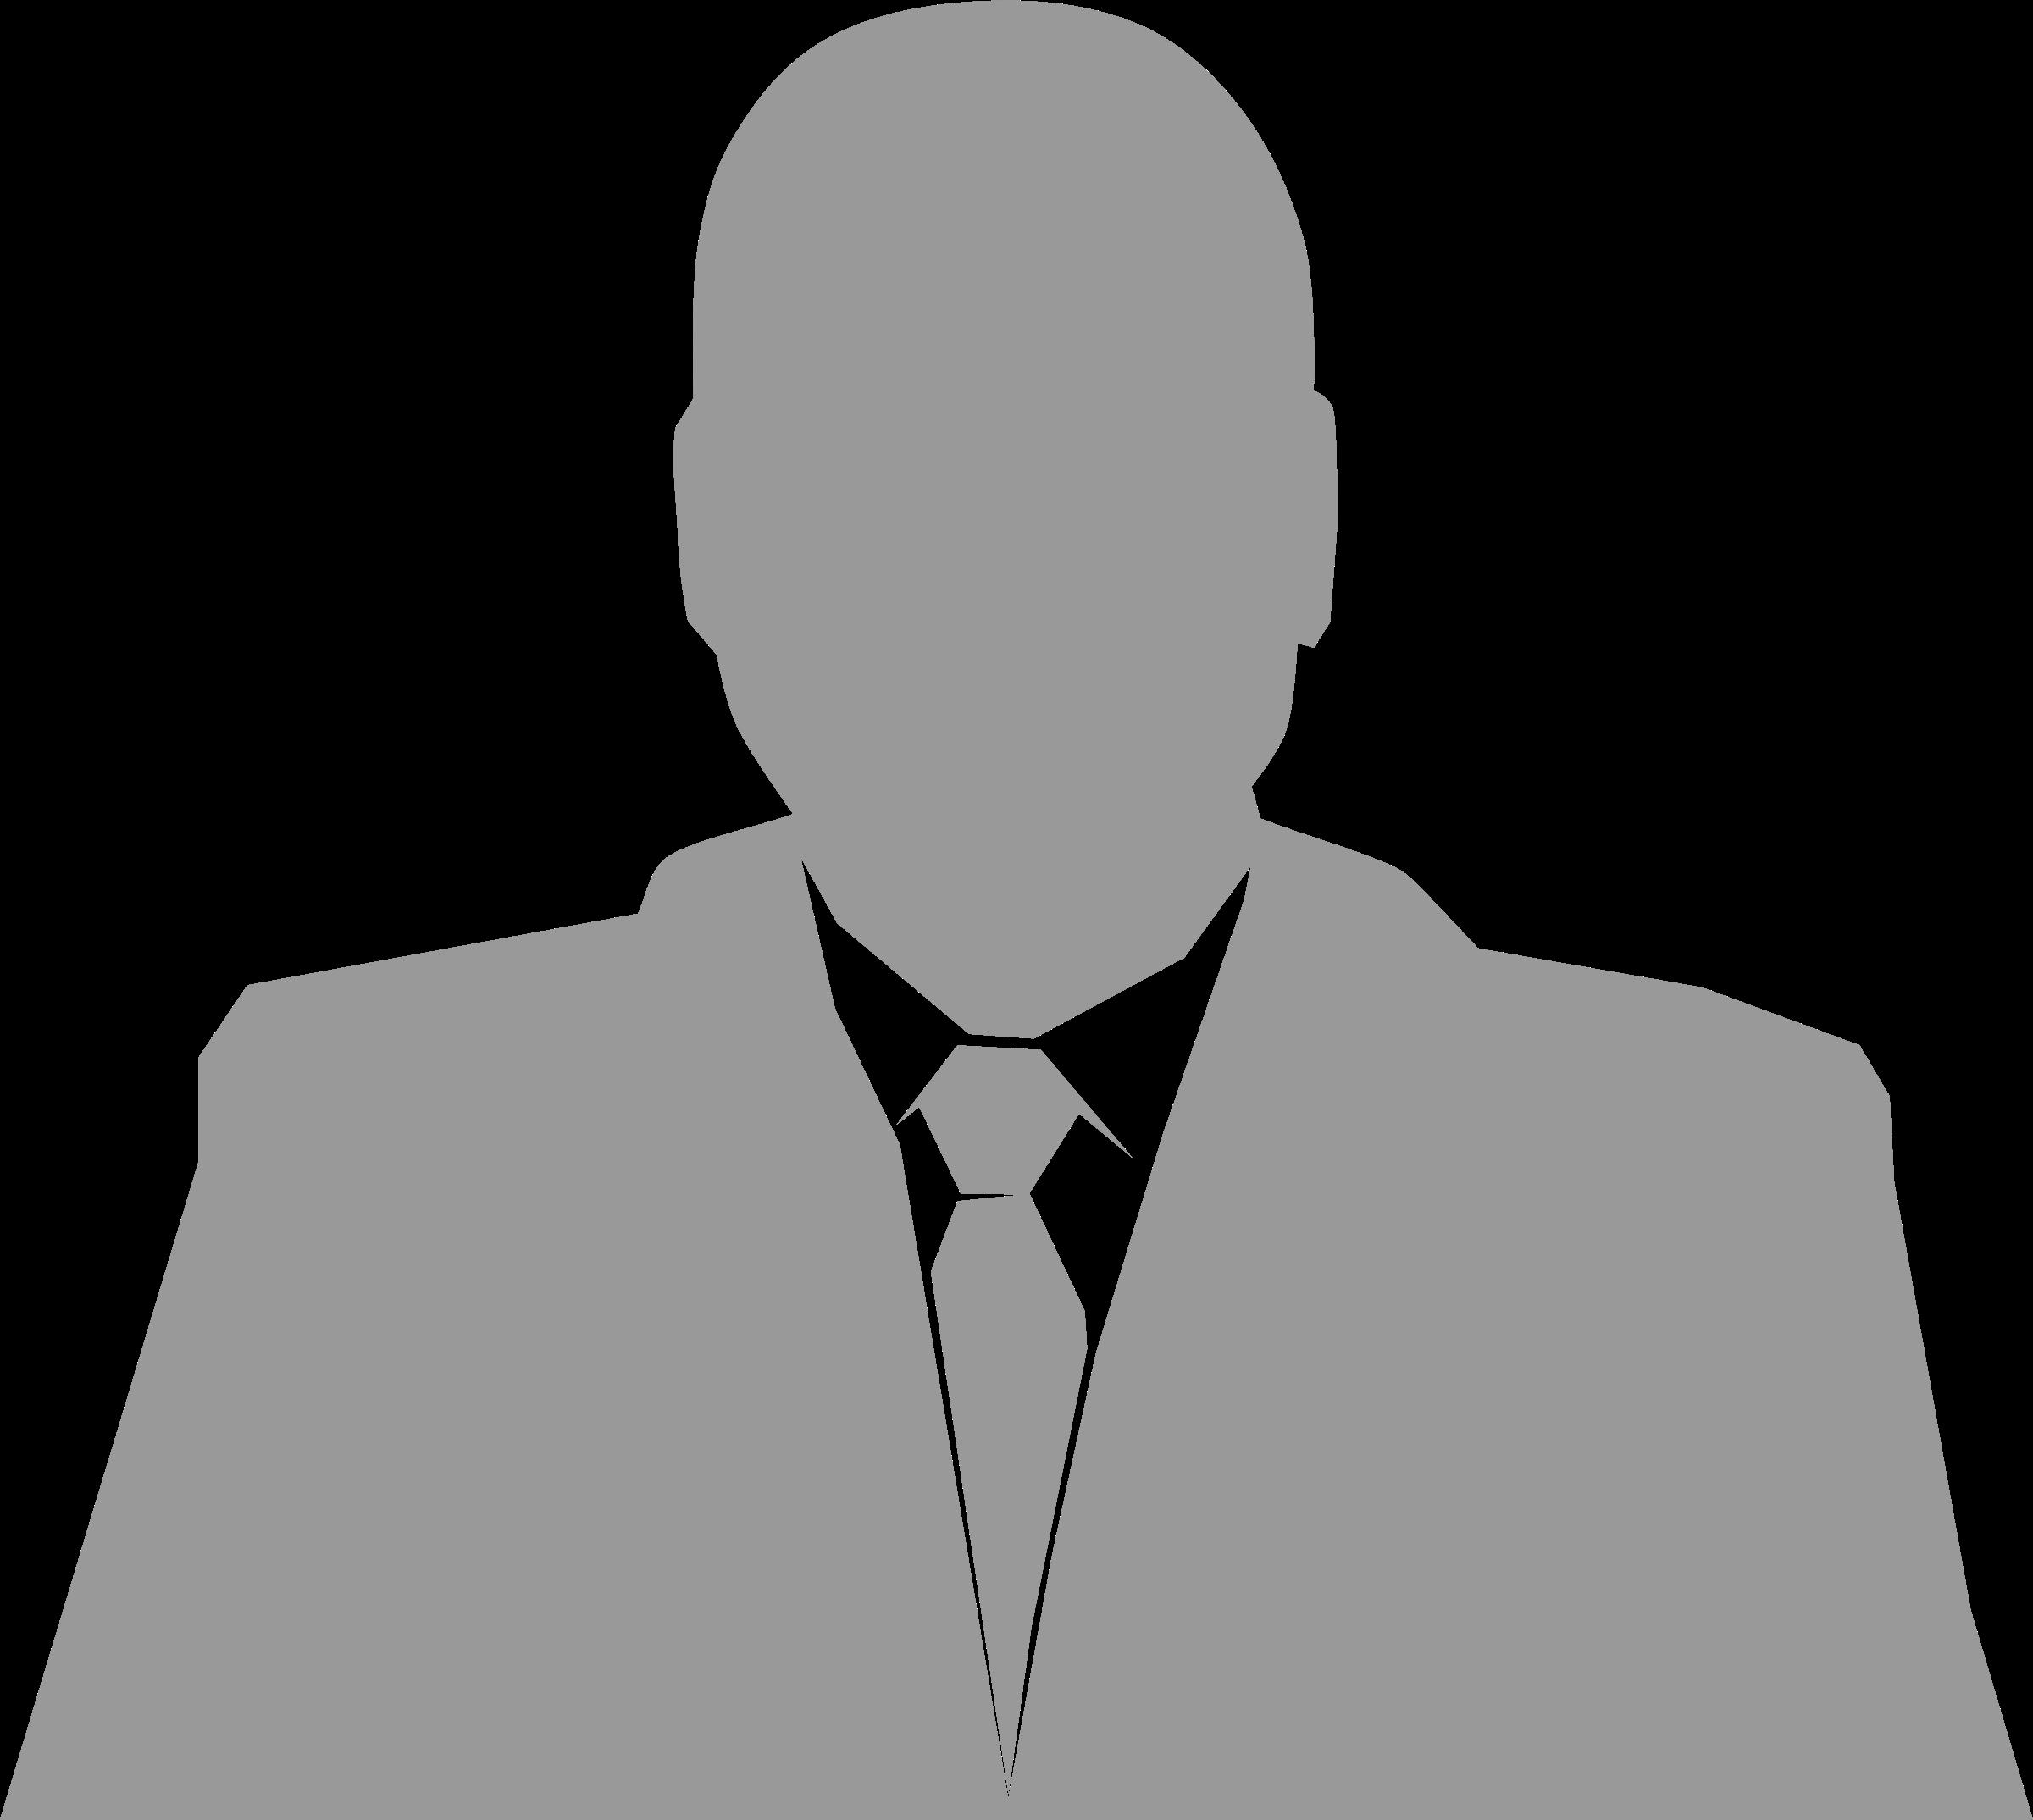 ProfilePlaceholderSuit